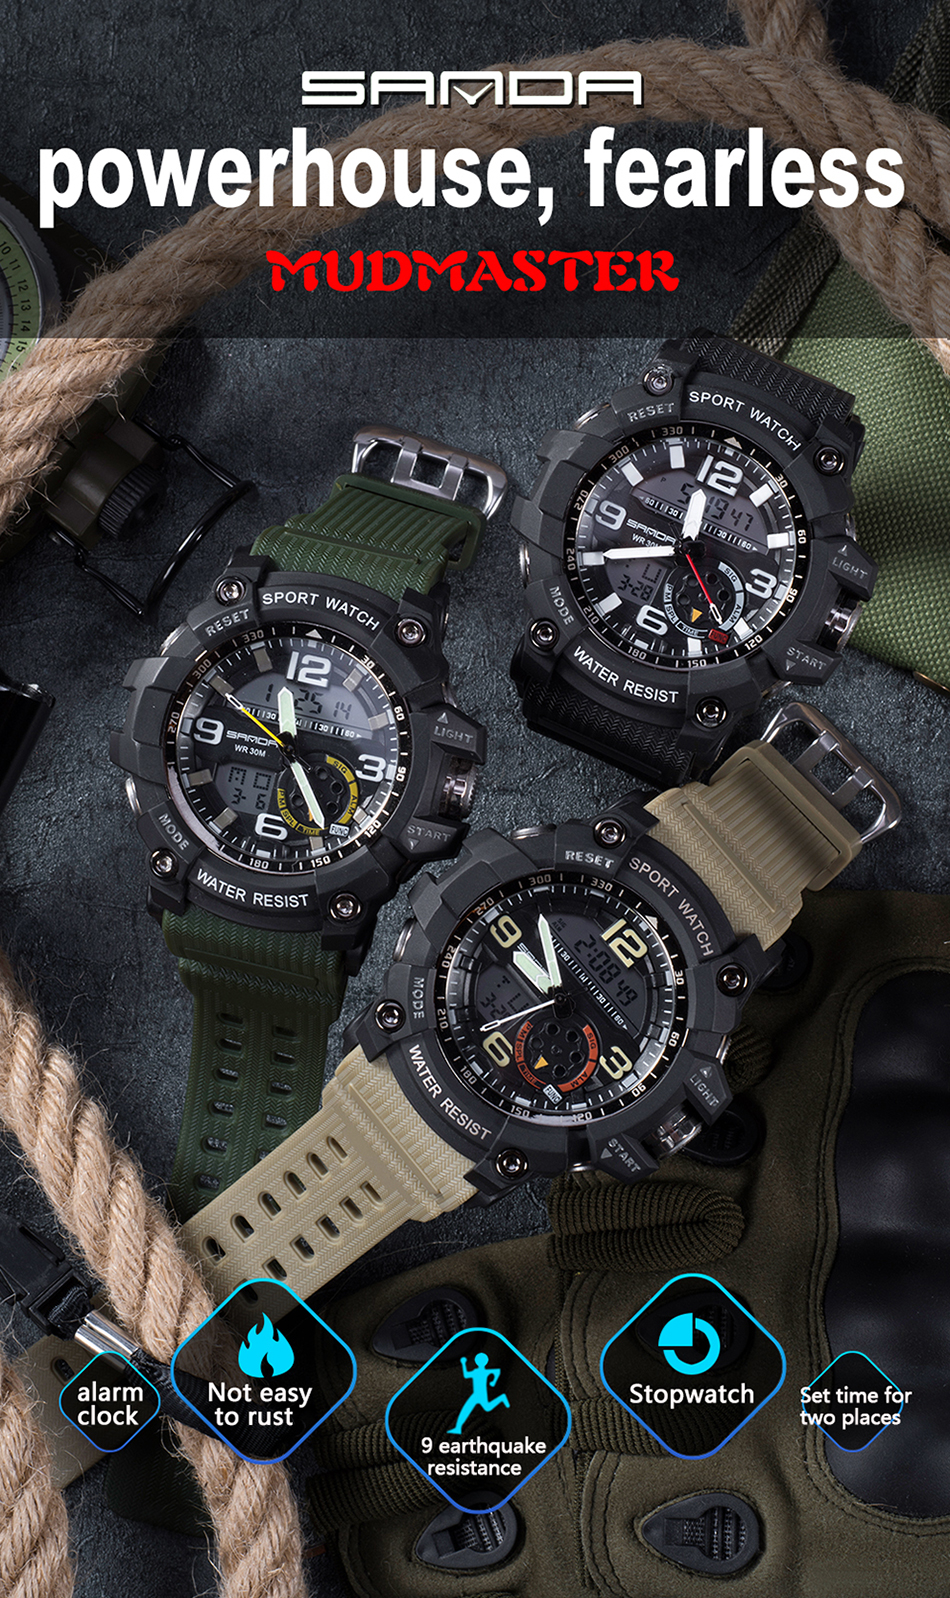 HTB1Hd6dueuSBuNjSsplq6ze8pXa1 SANDA 759 Sports Men's Watches Top Brand Luxury Military Quartz Watch Men Waterproof S Shock Wristwatches relogio masculino 2019